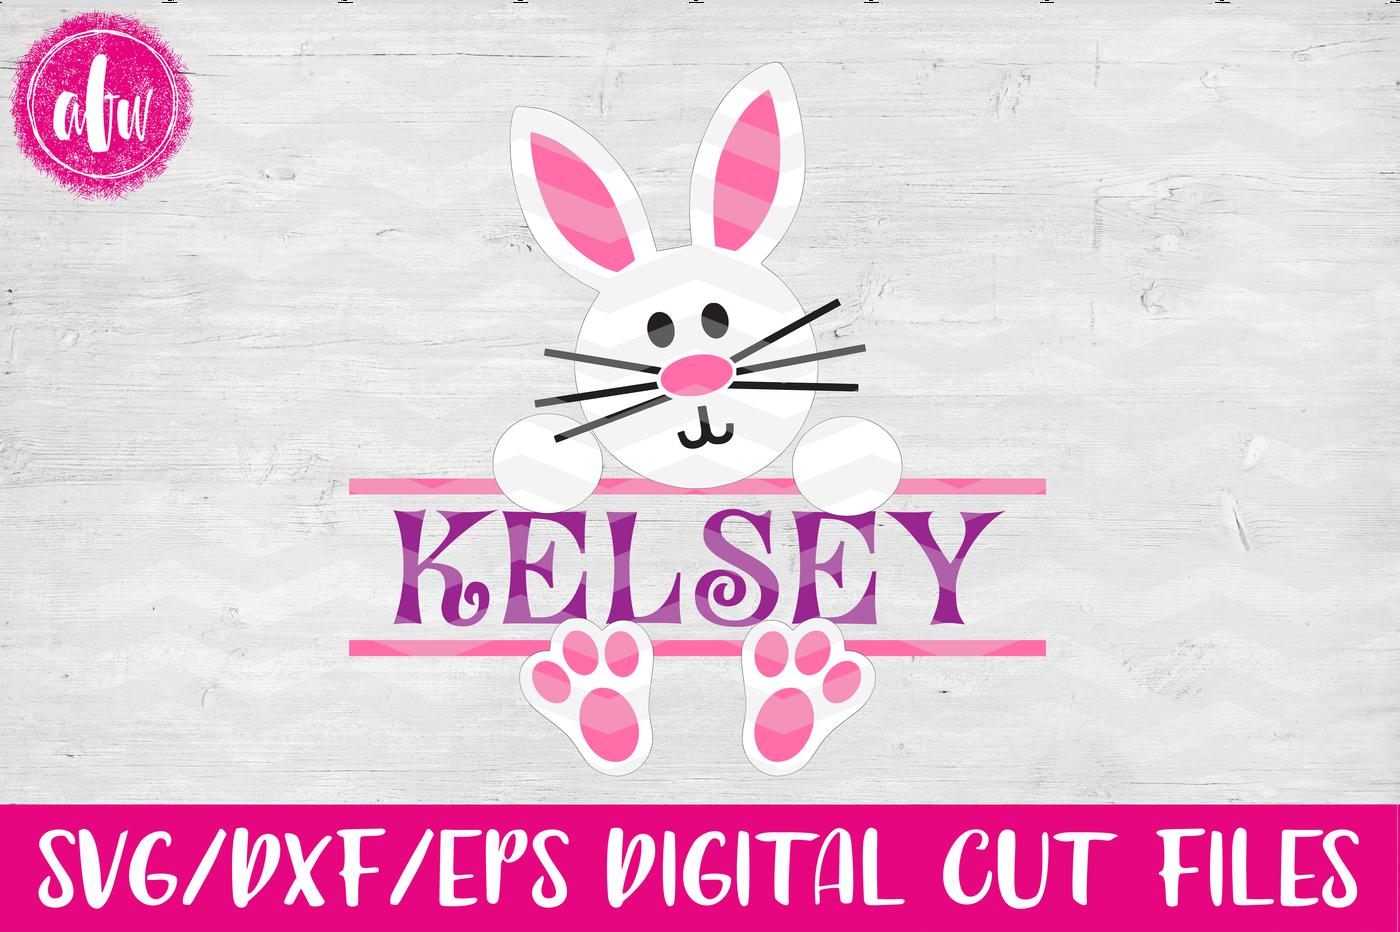 Split Bunny Svg Dxf Eps Cut File By Afw Designs